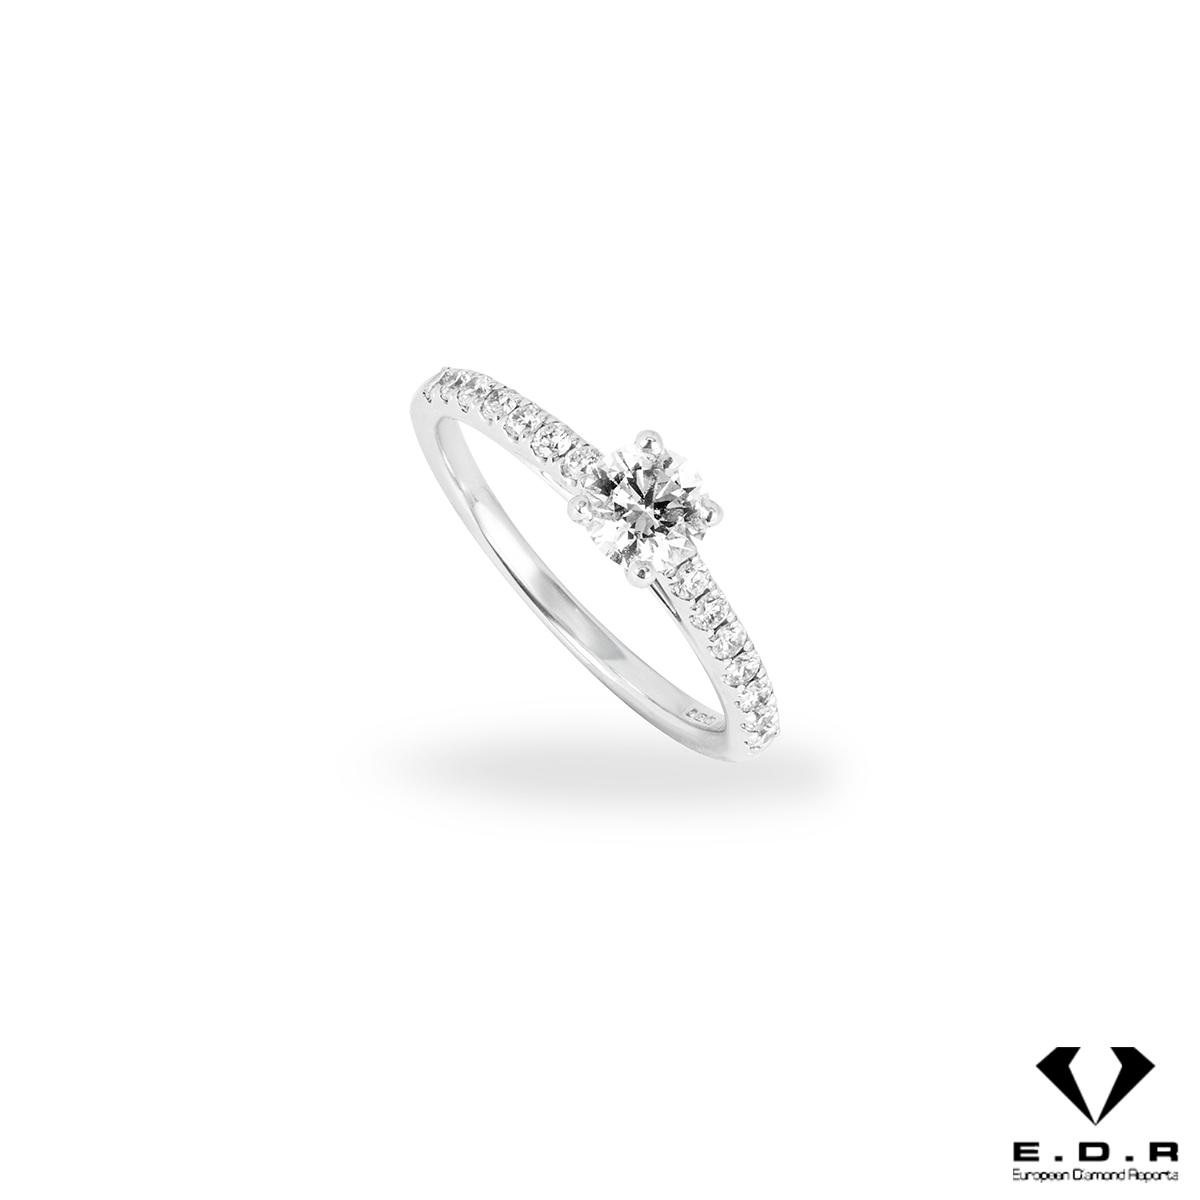 18k White Gold Round Brilliant Cut Diamond Ring 0.50ct H/VS1